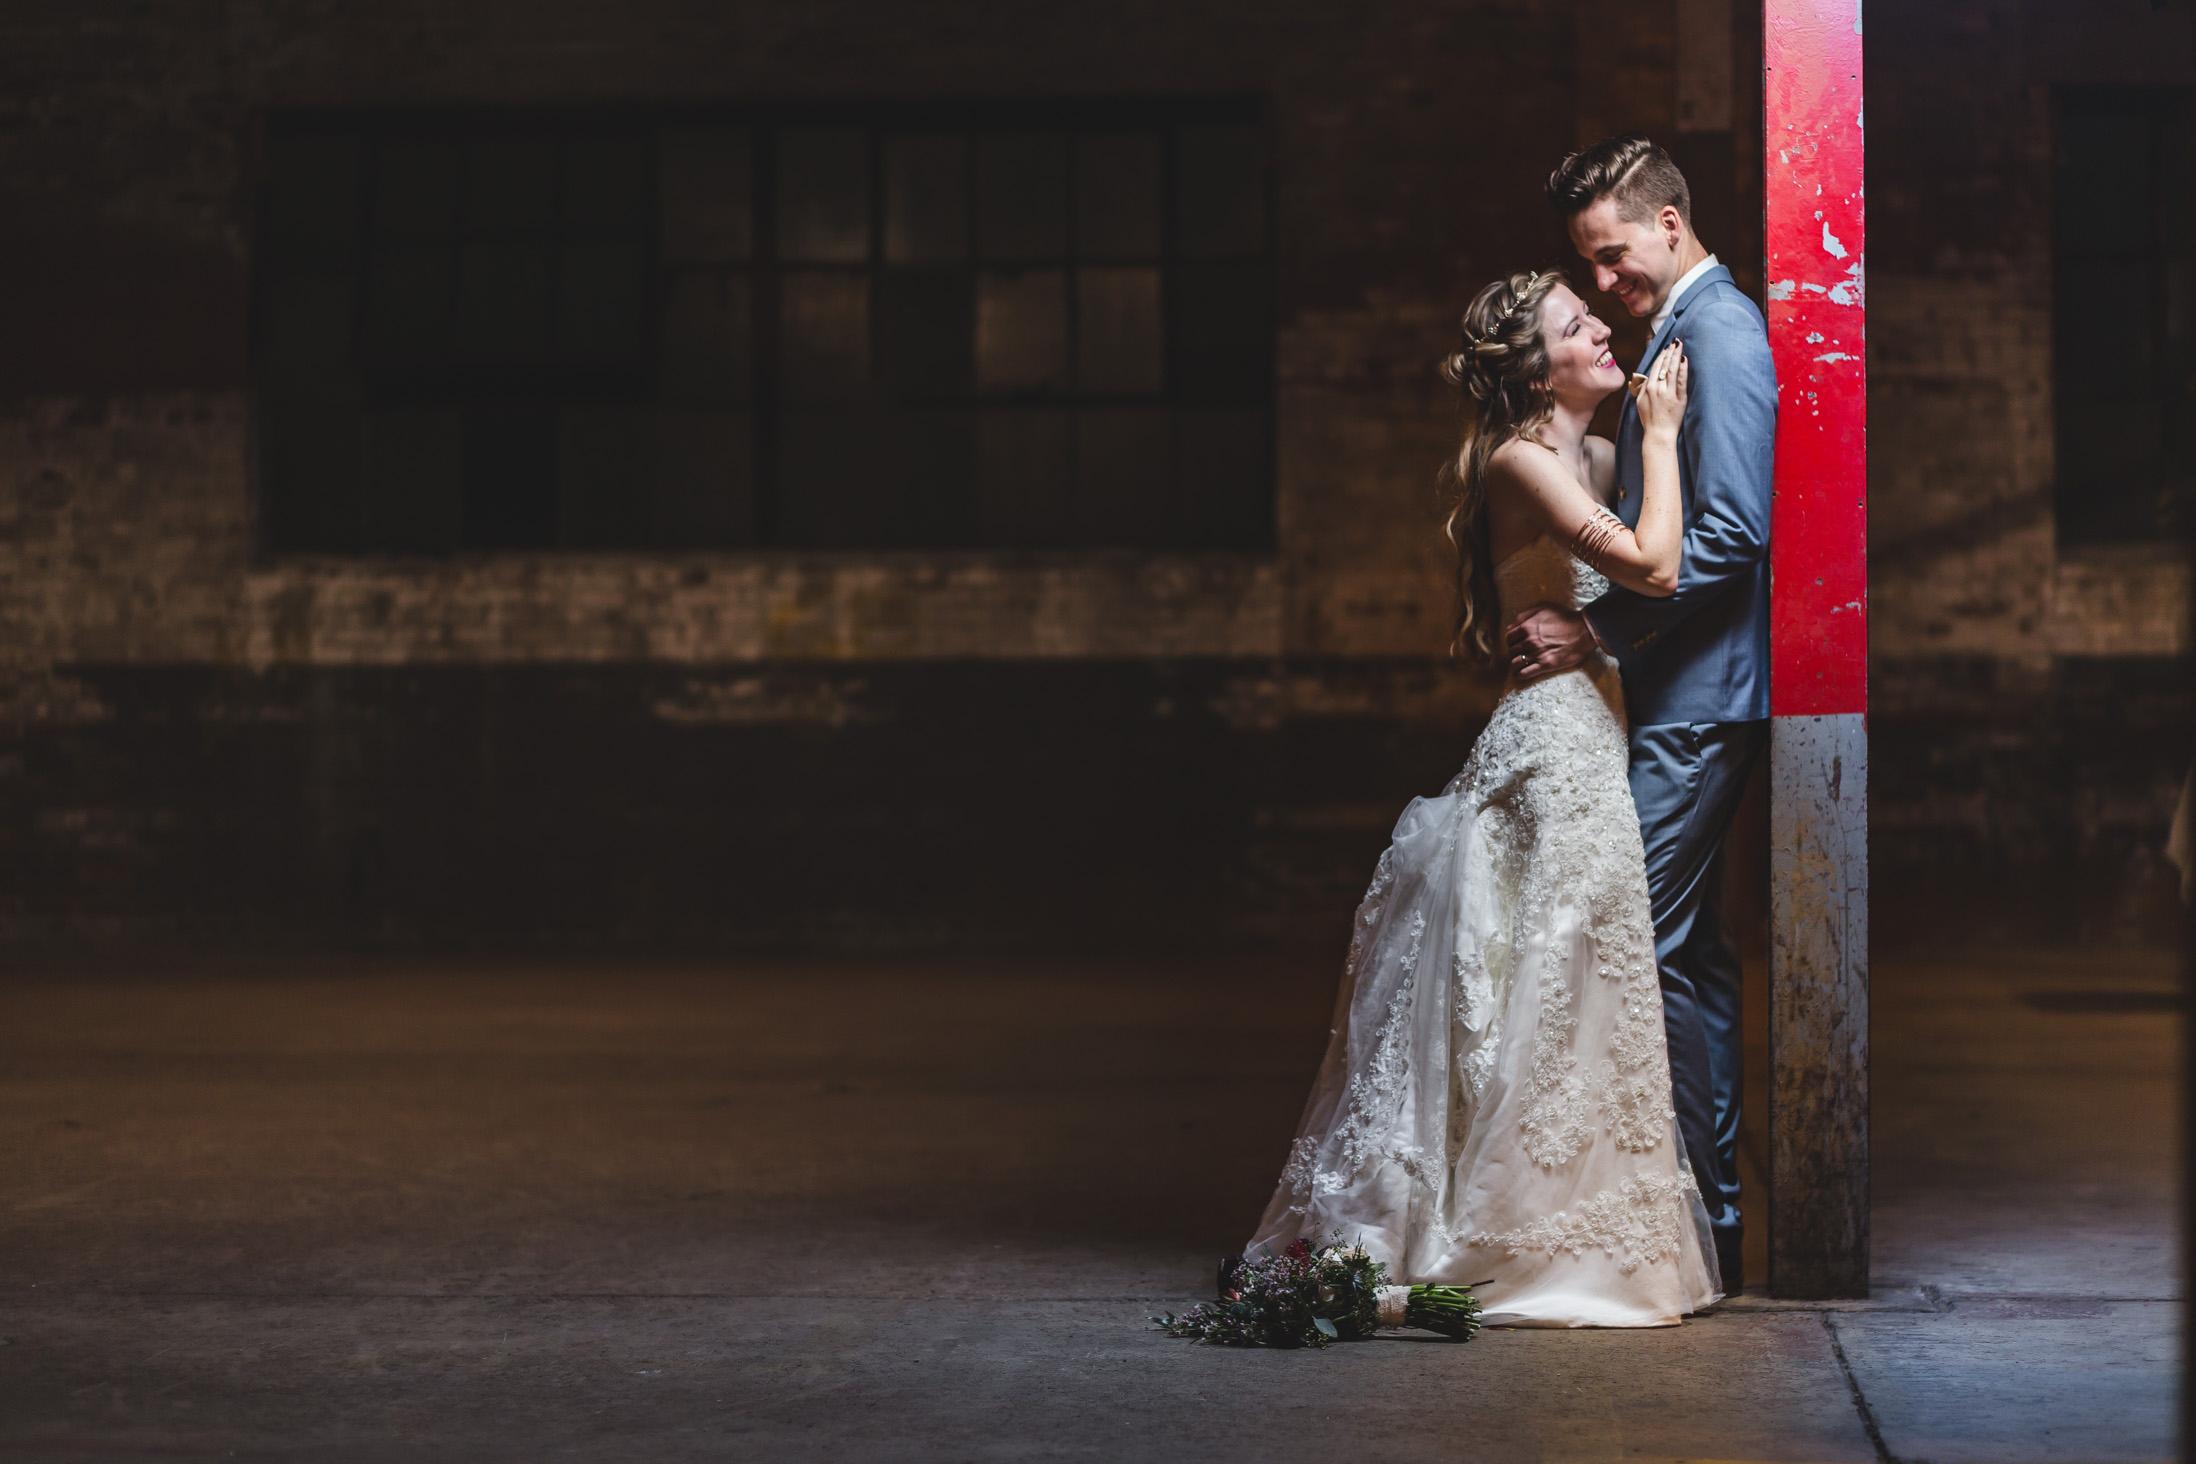 Adam-Szrmack-The-Glass-Factory-Wedding-127.jpg